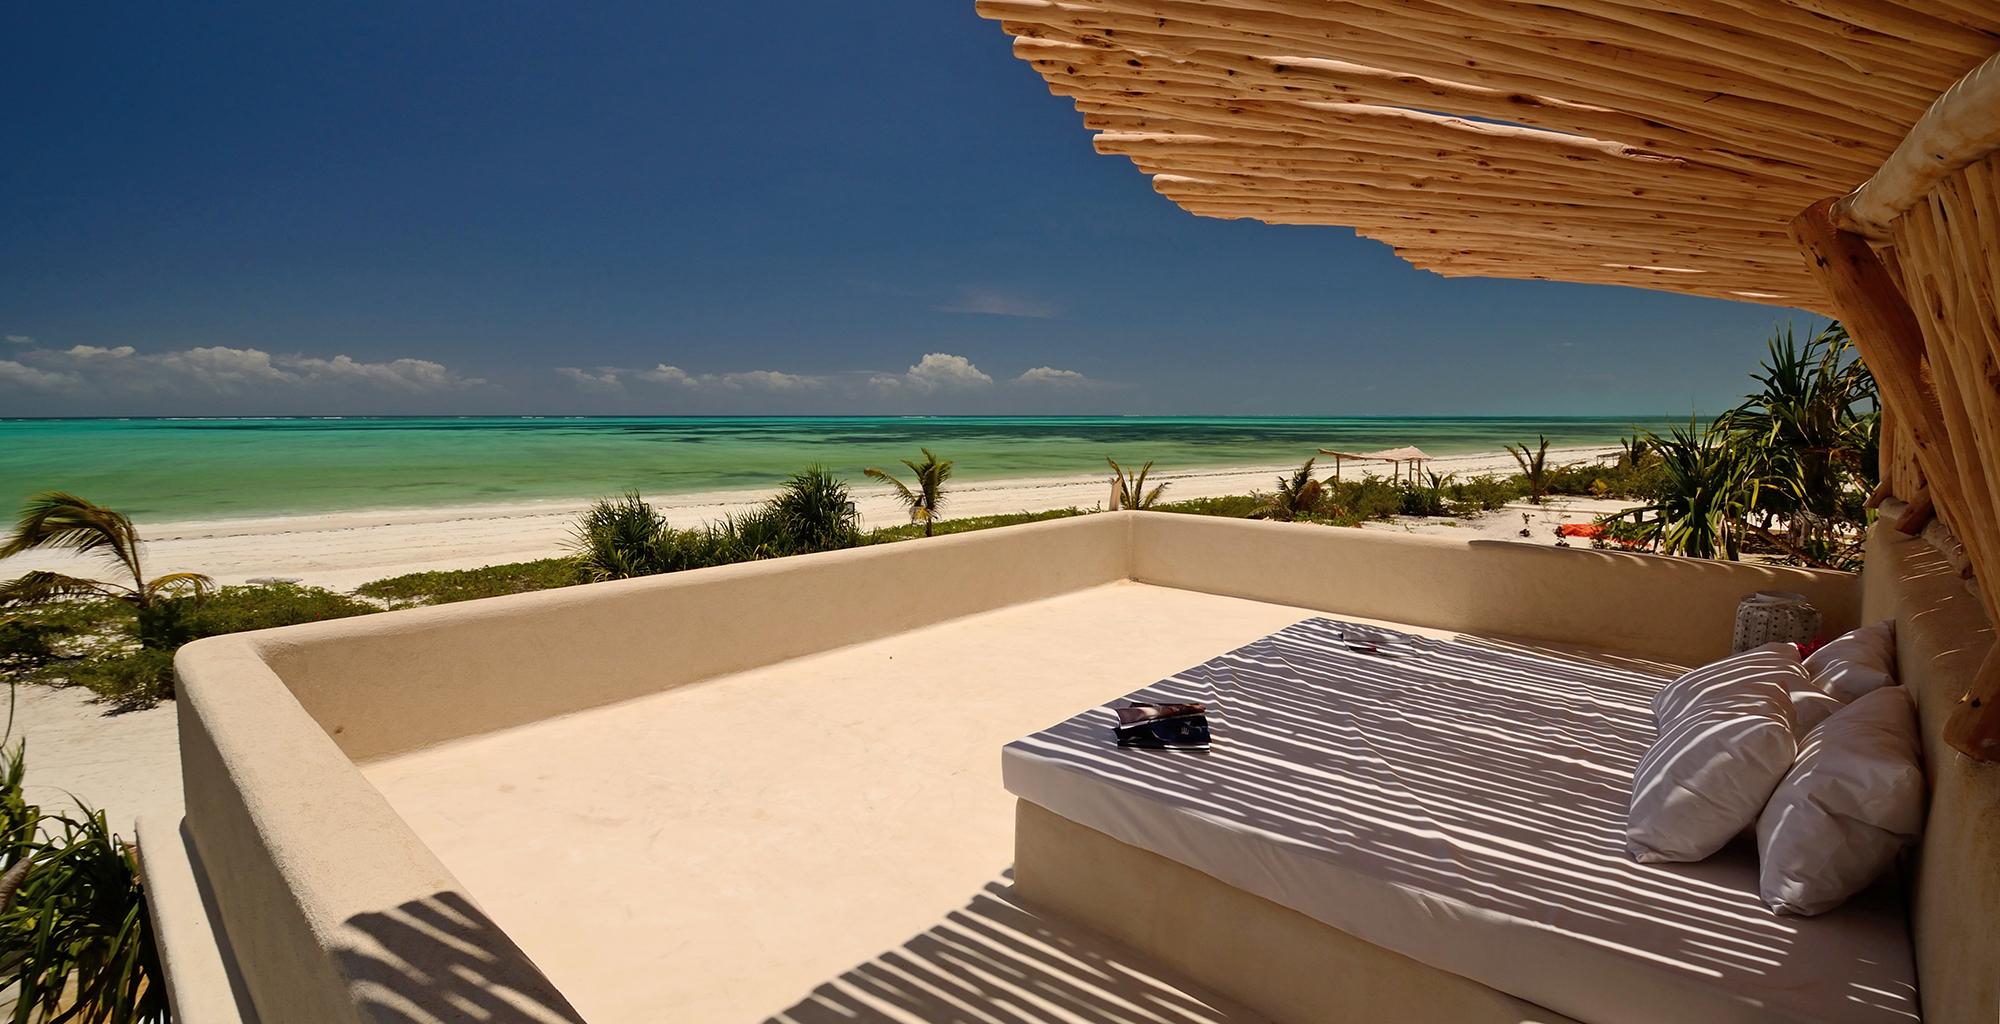 Tanzania-White-Sand-Villas-Roof-Terrace